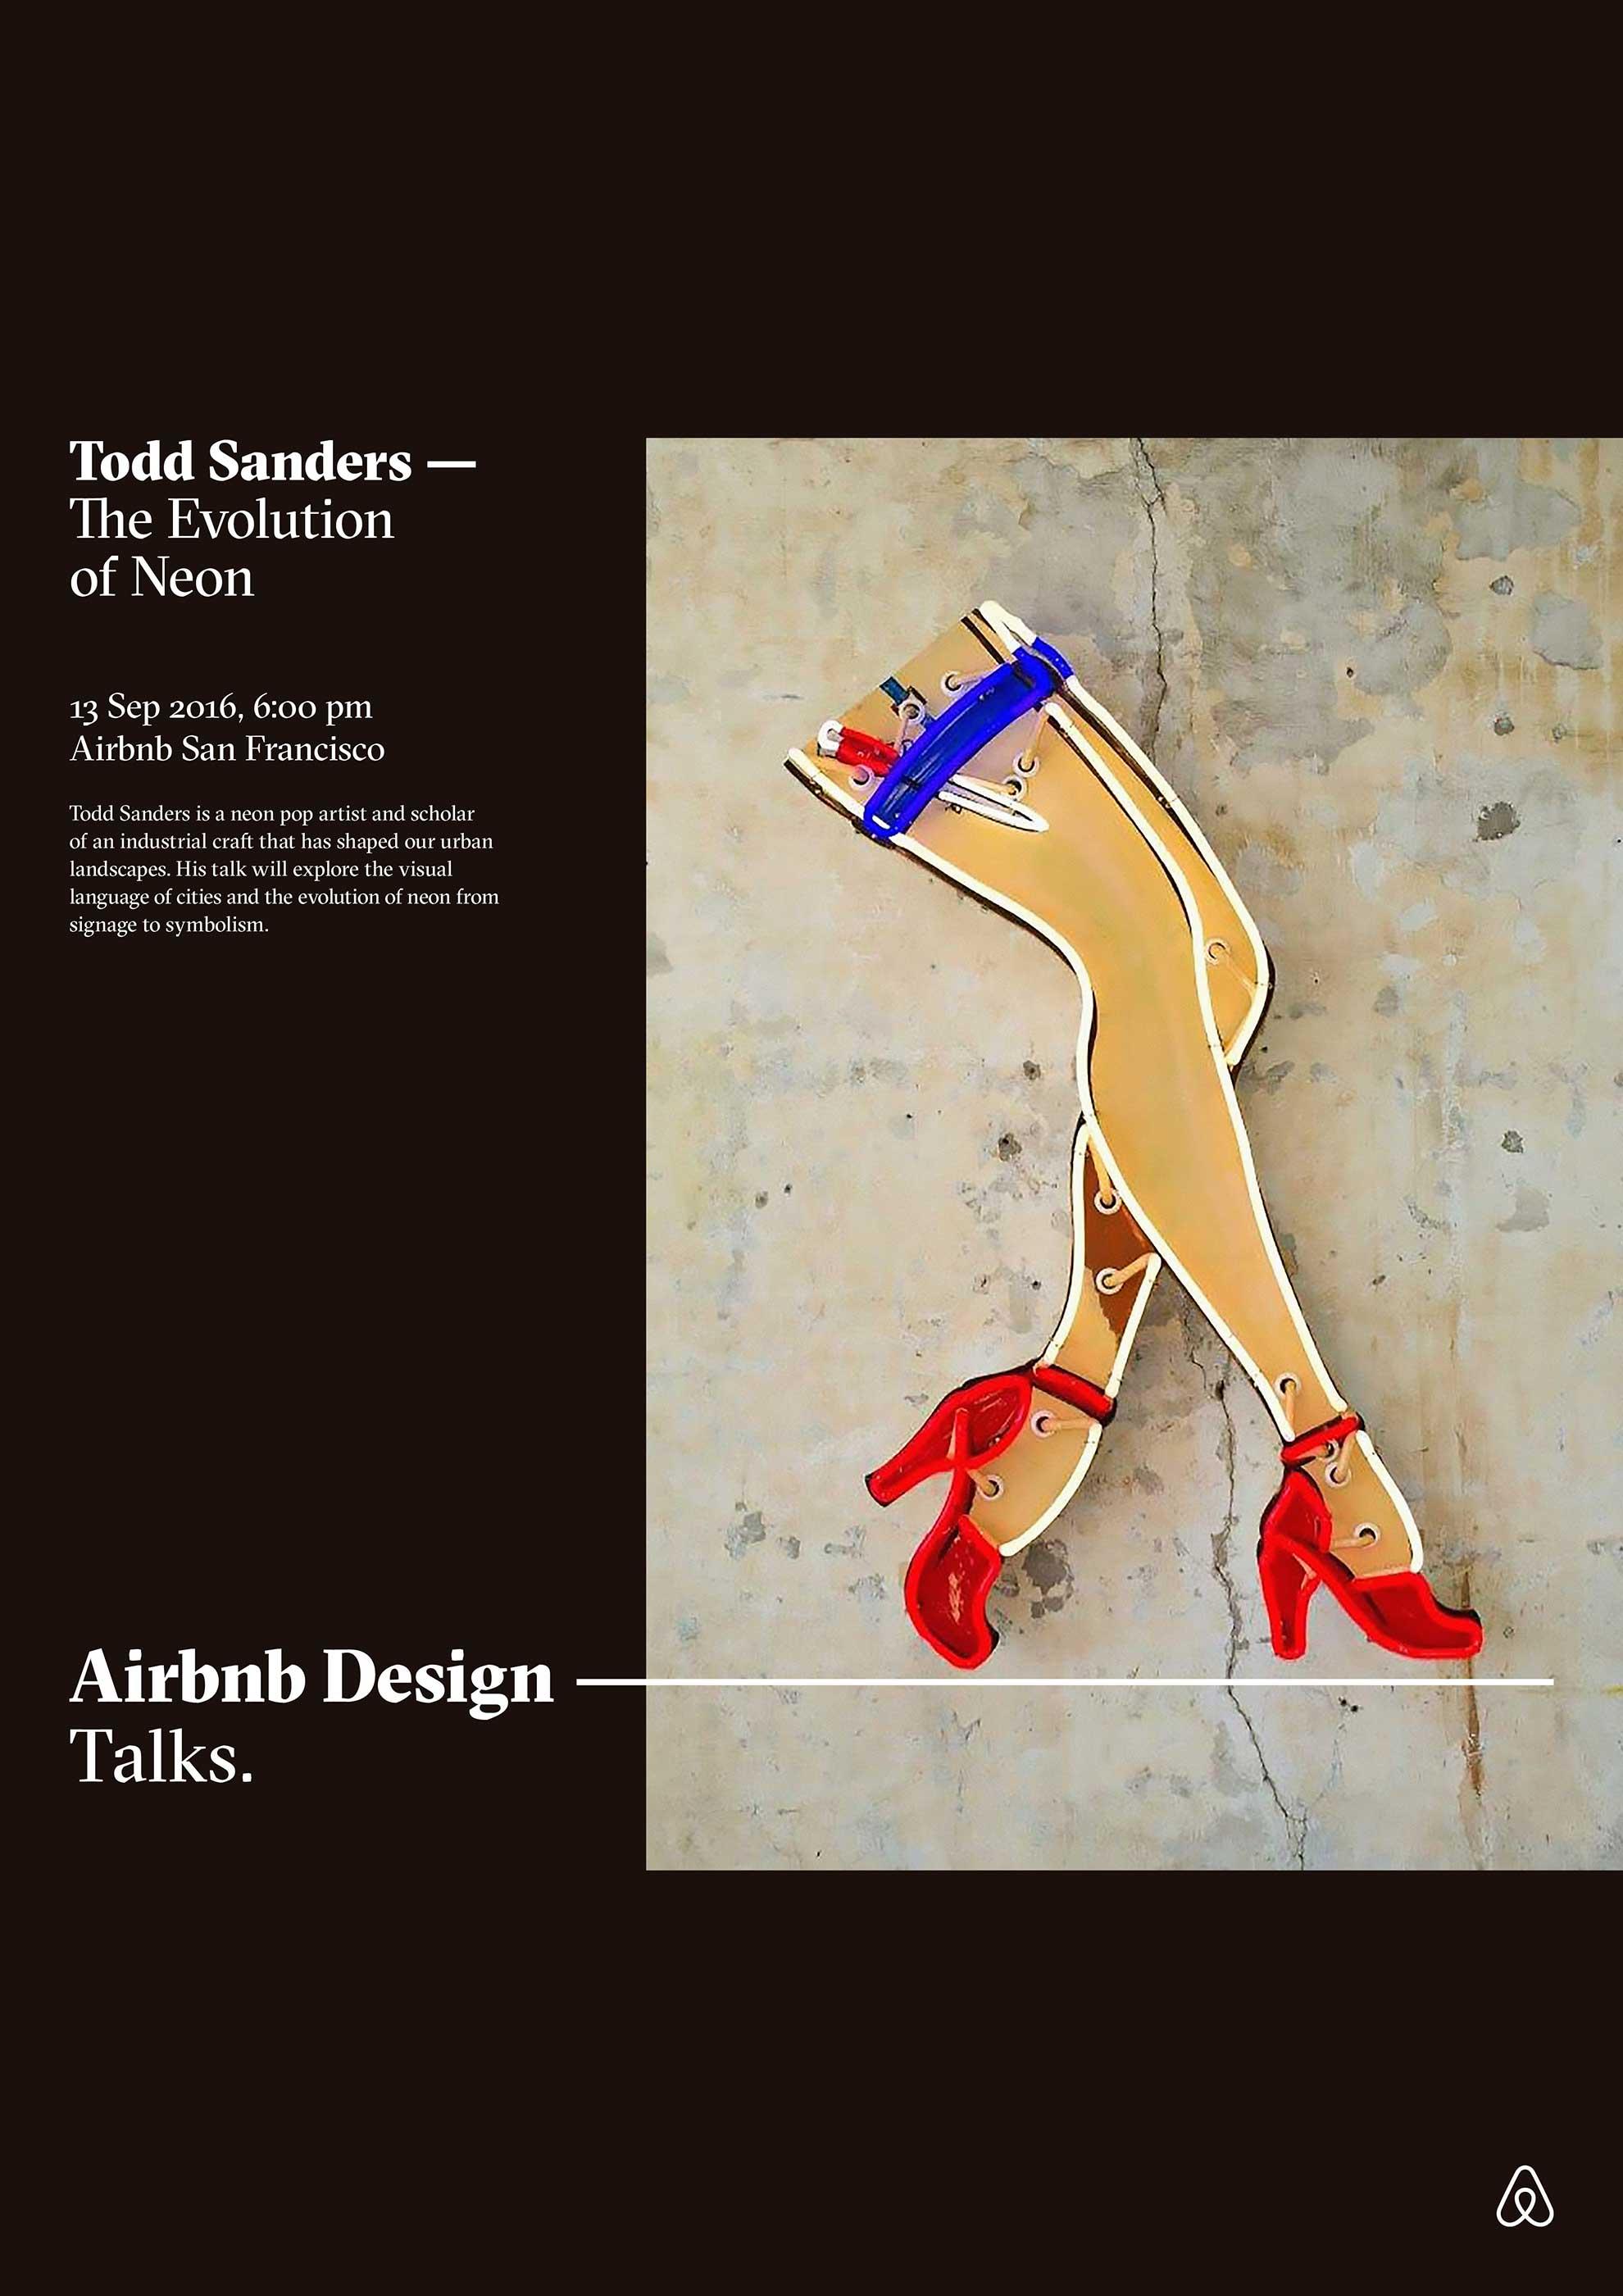 web-opt-designtalks_toddsanders_poster_v2